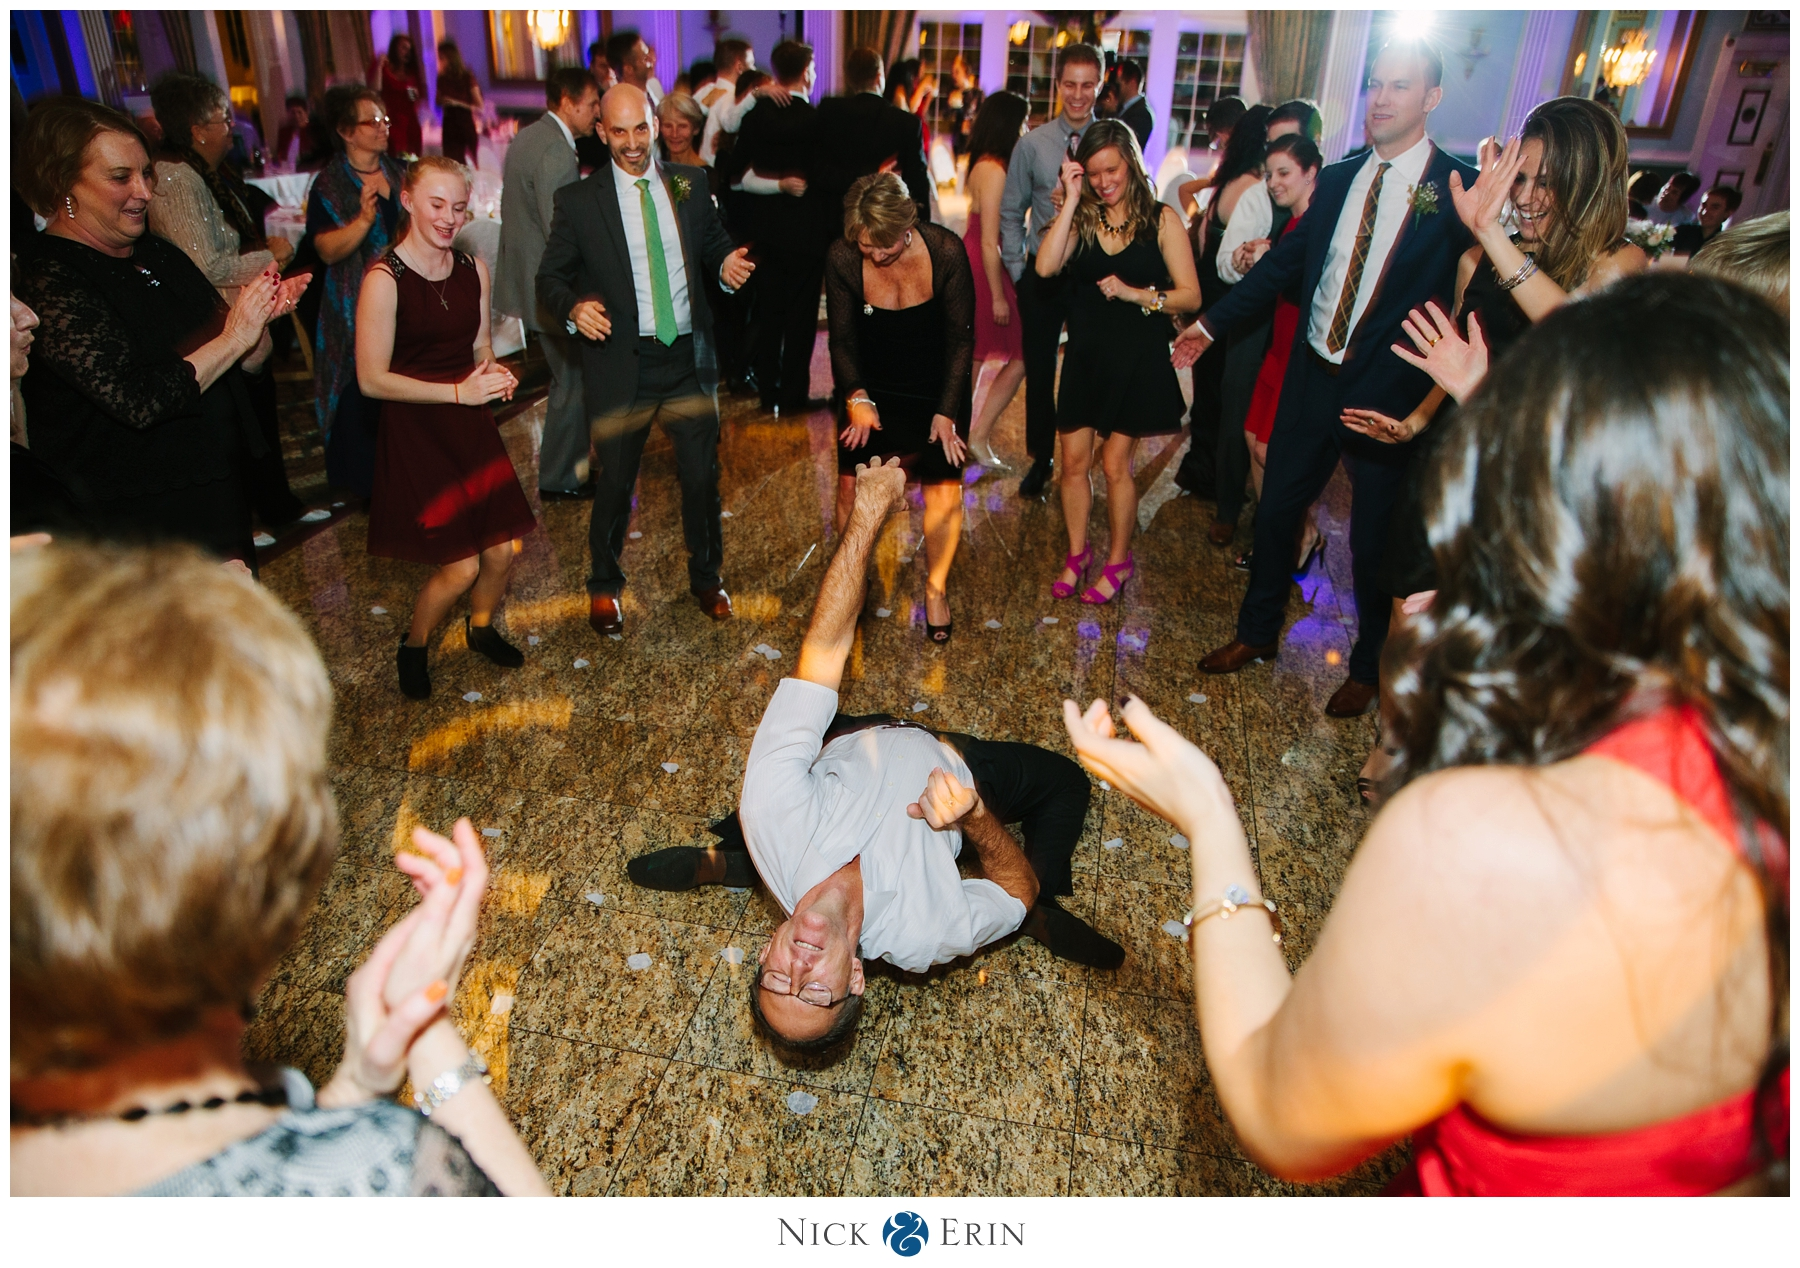 Donner_Photography_Mendenhall Inn Wedding_Blake & Kristina_0044